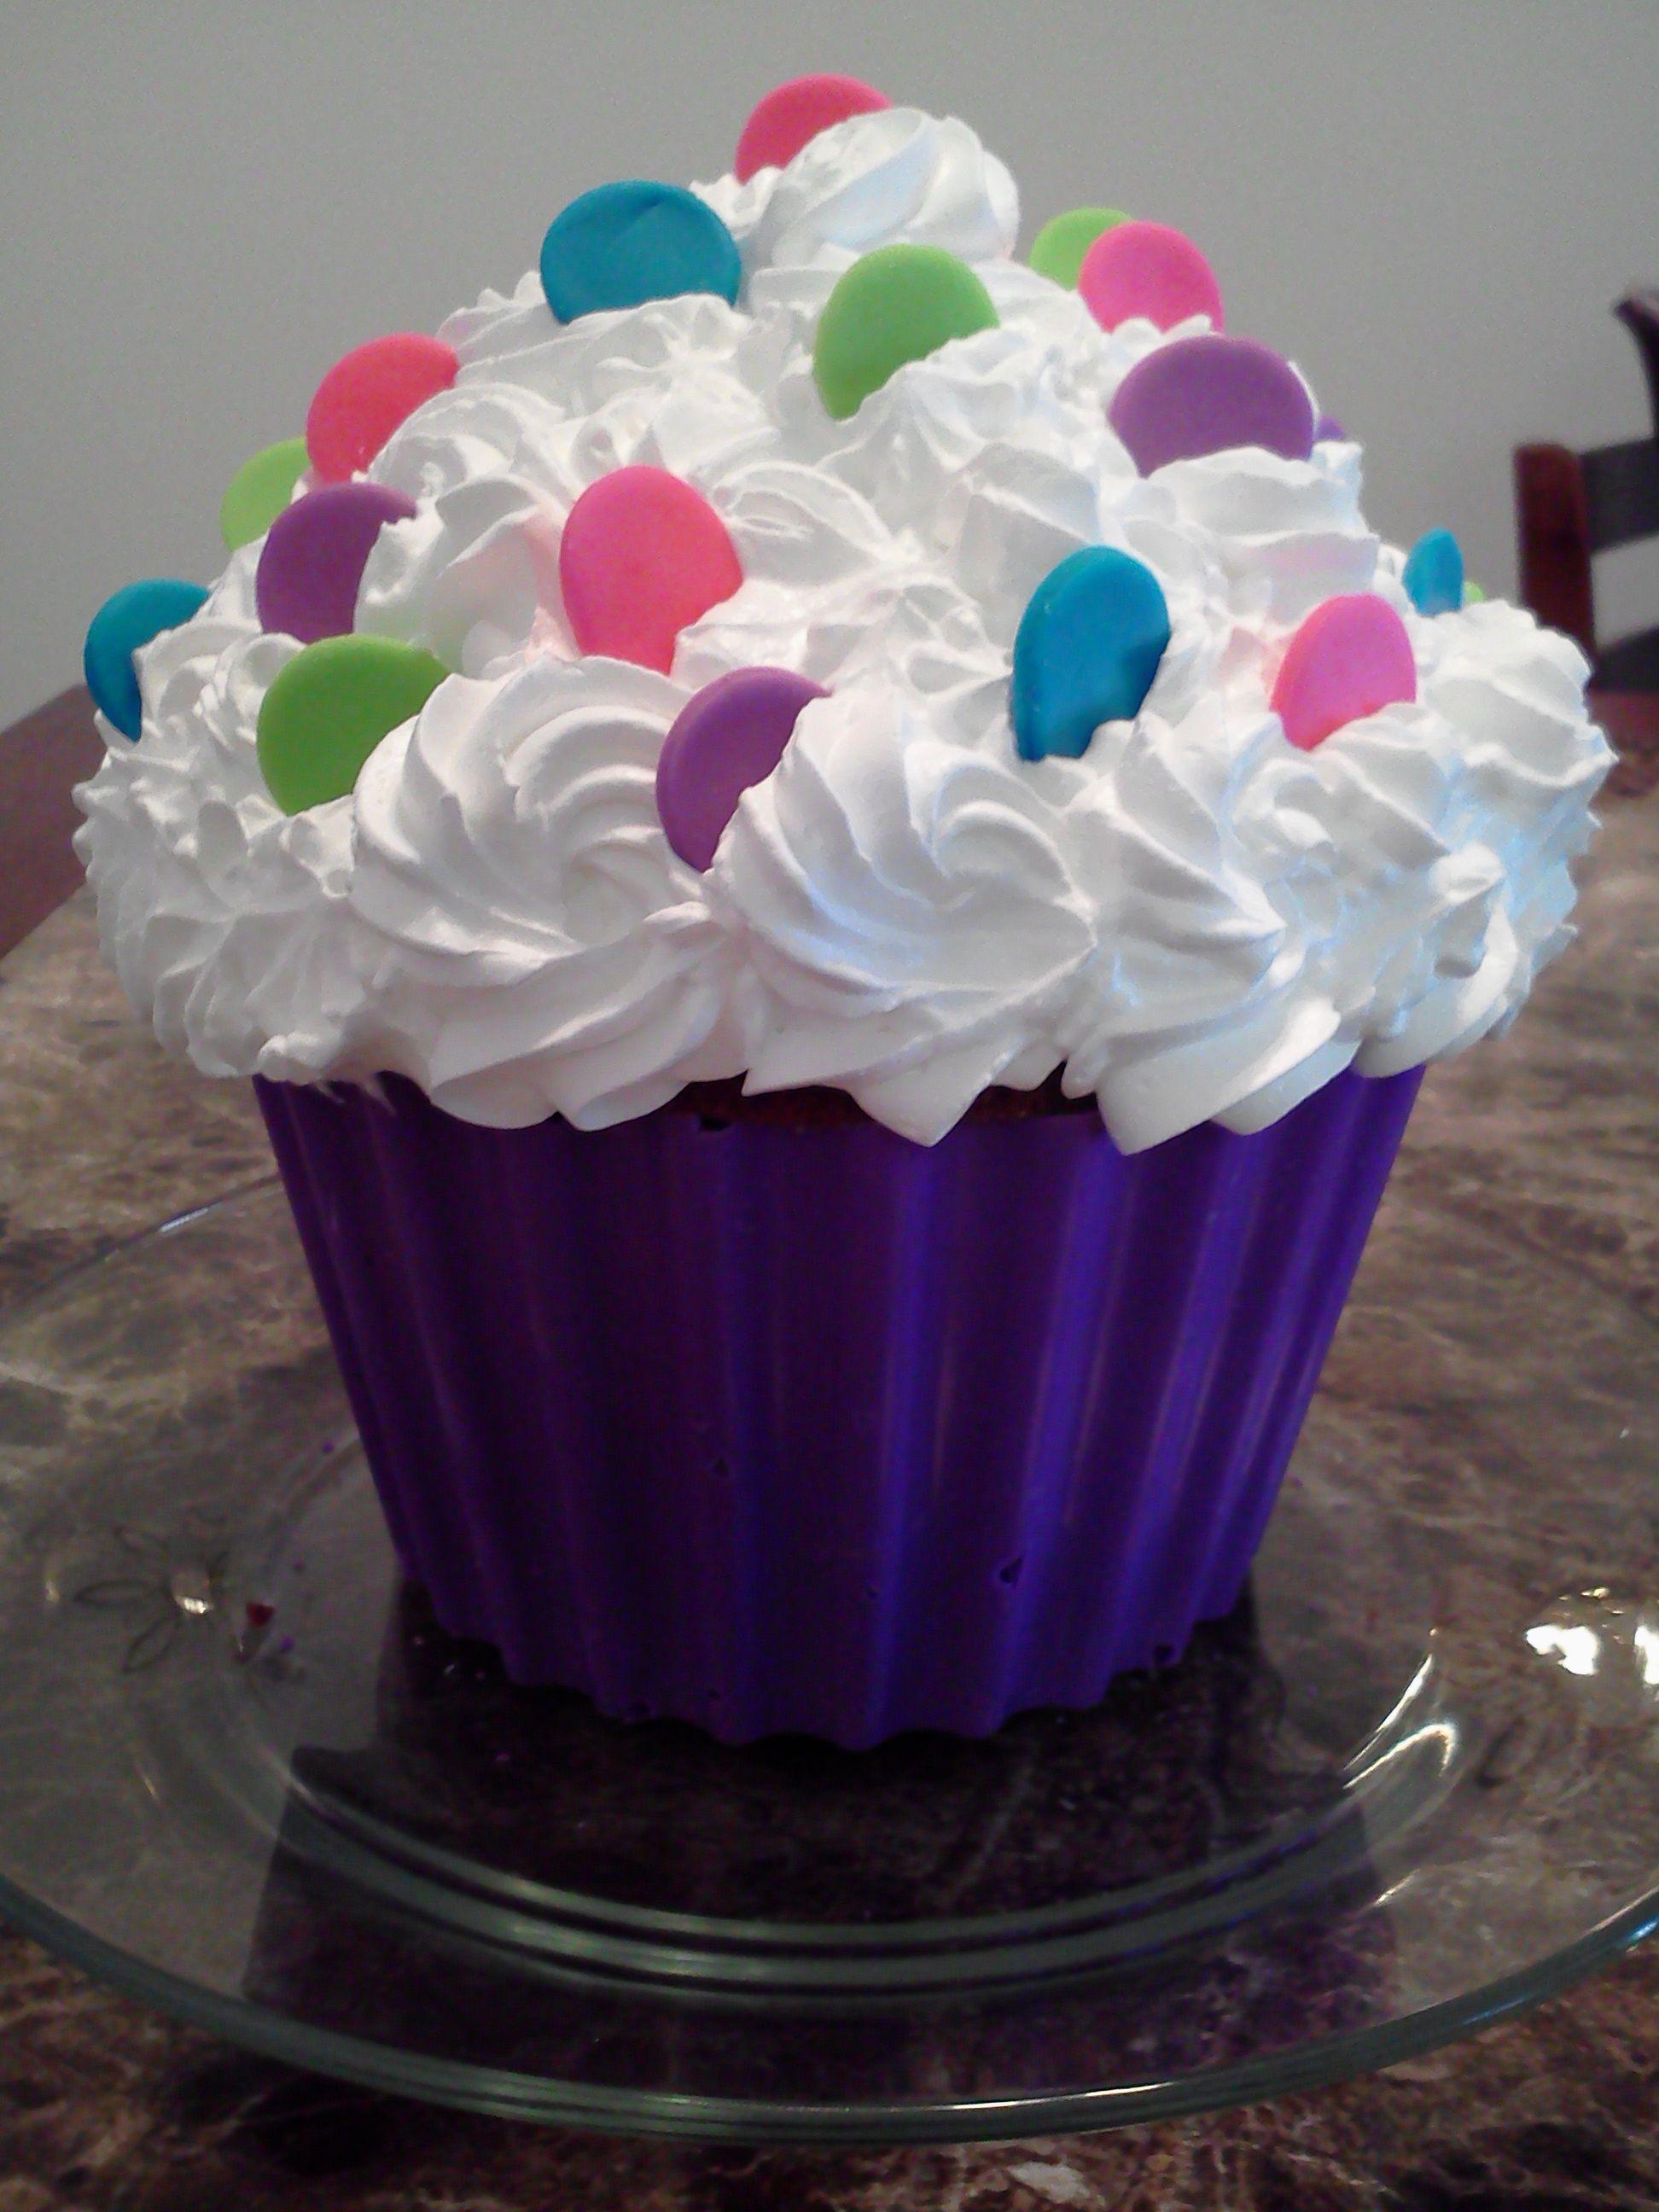 Giant cupcake cake strawberry cake with whip cream icing